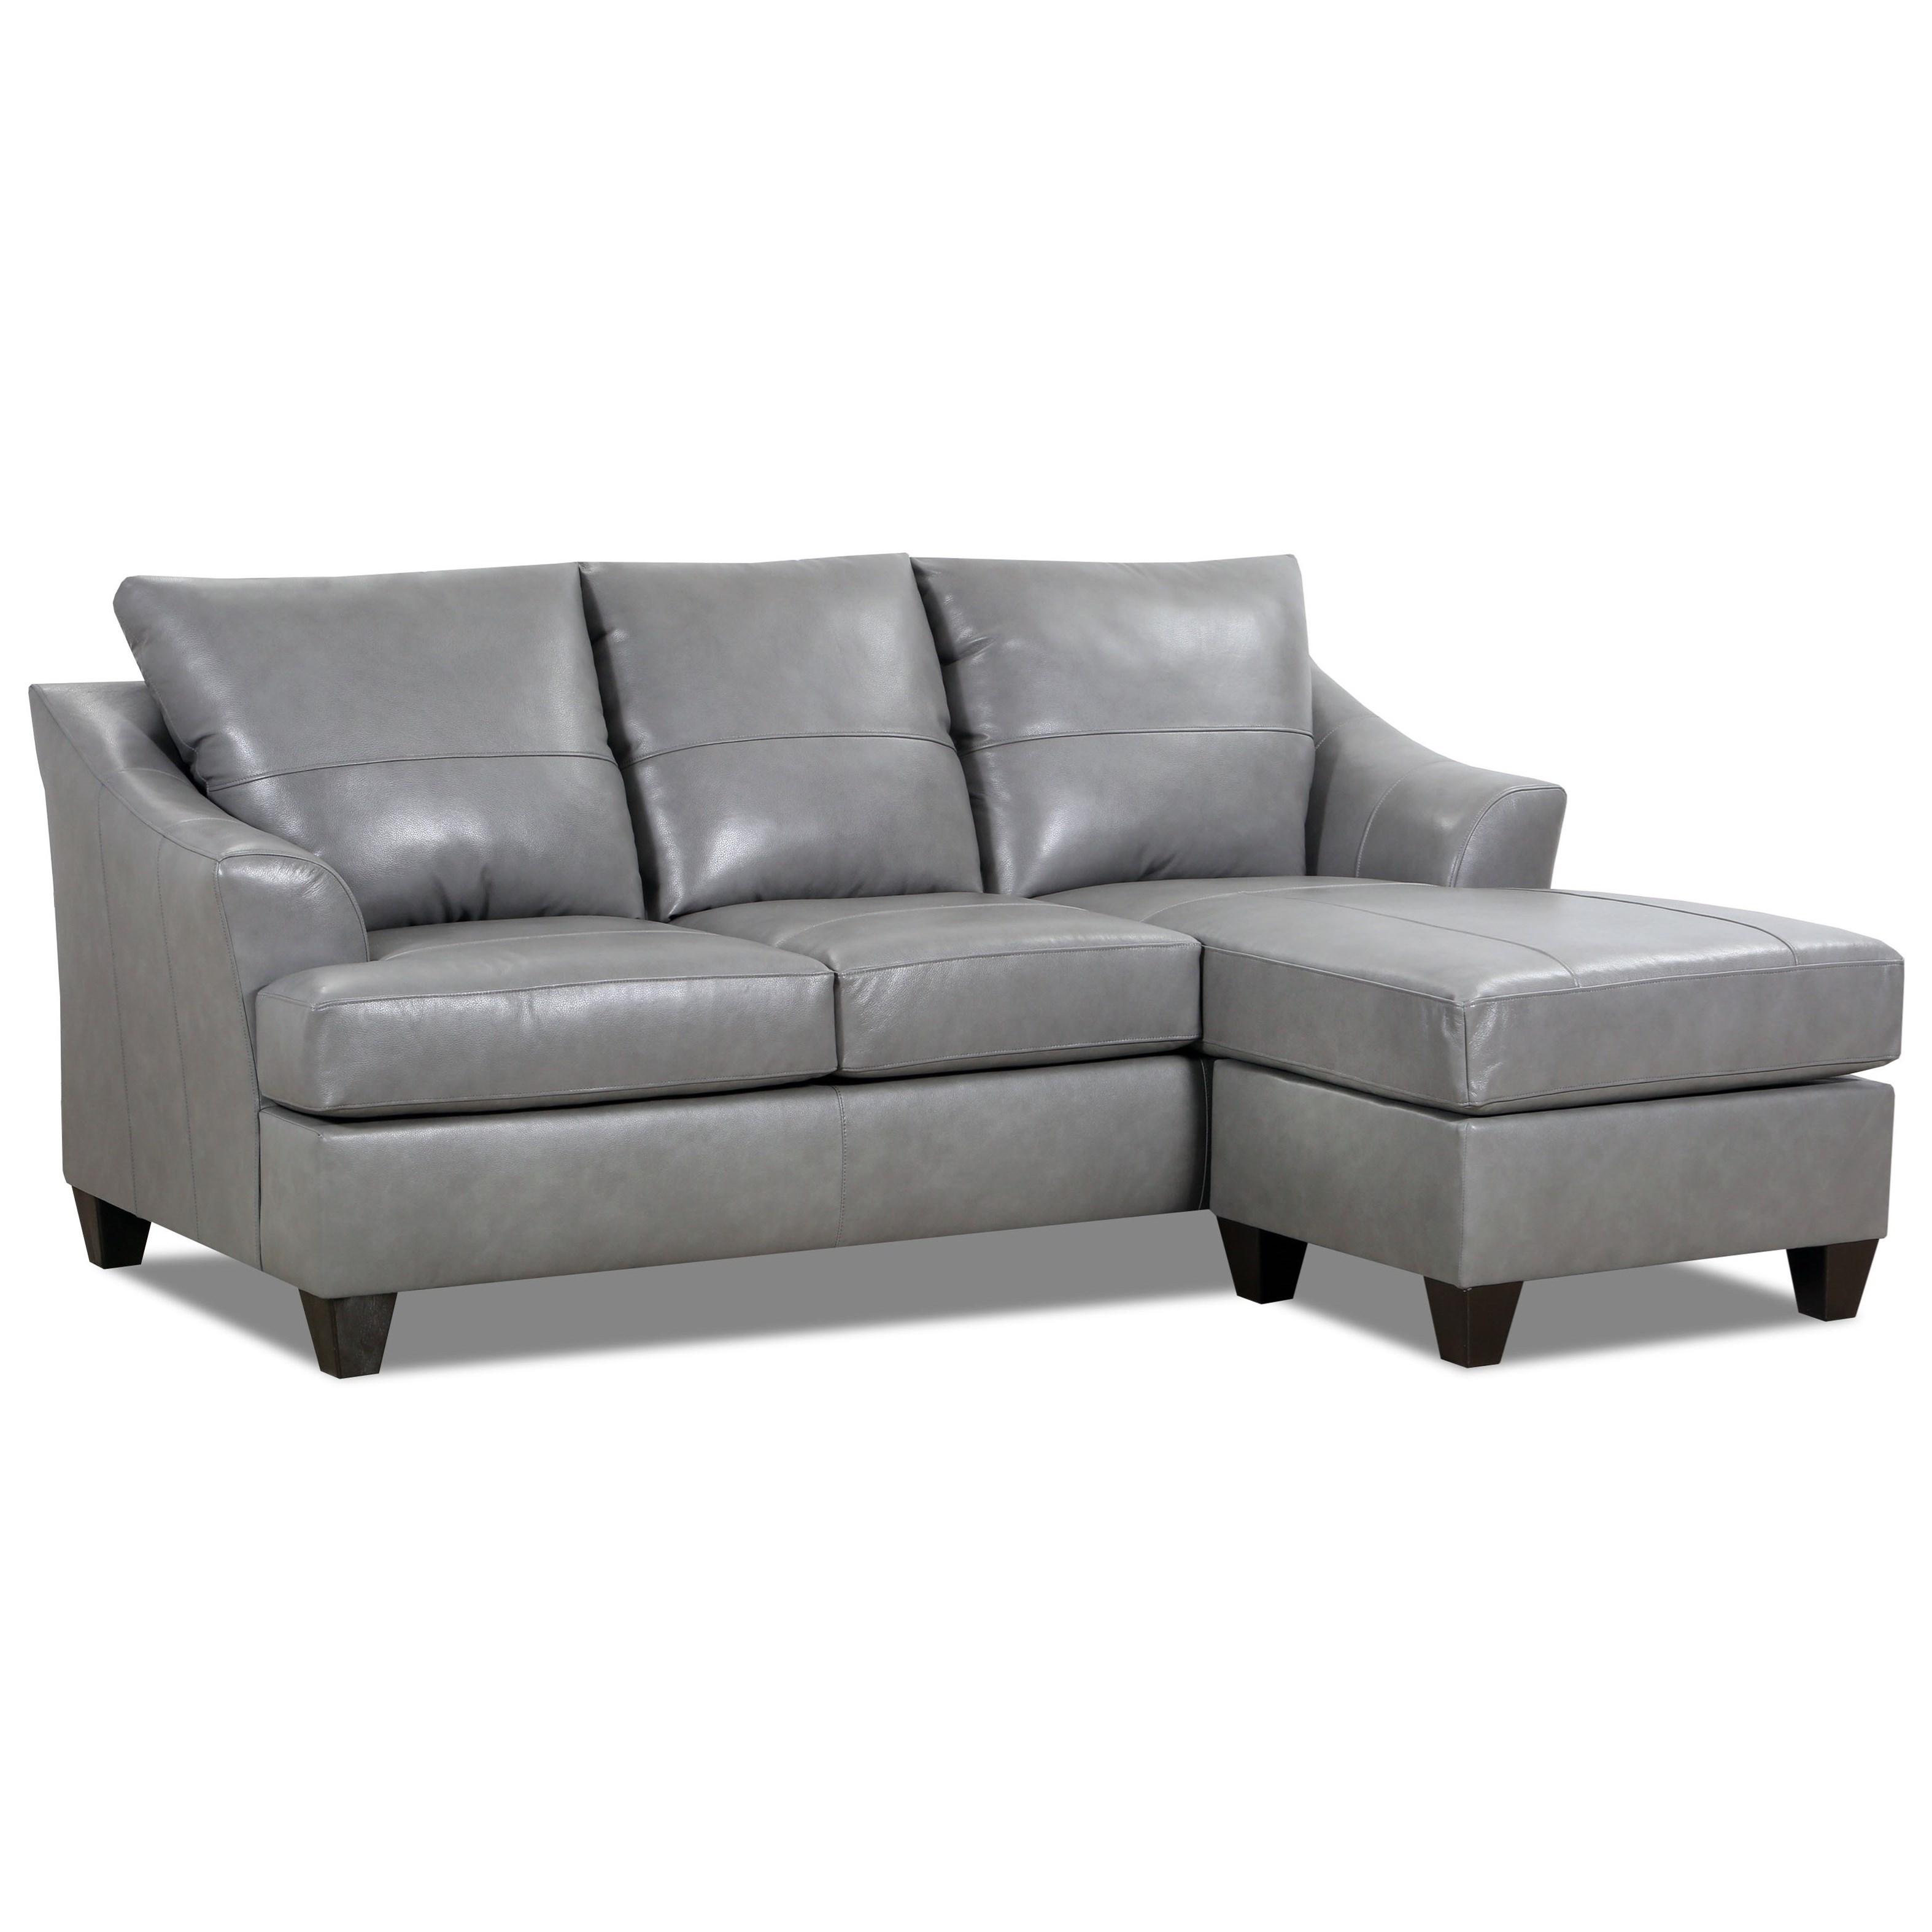 Carlisle Sofa Chaise by Lane at Furniture Fair - North Carolina